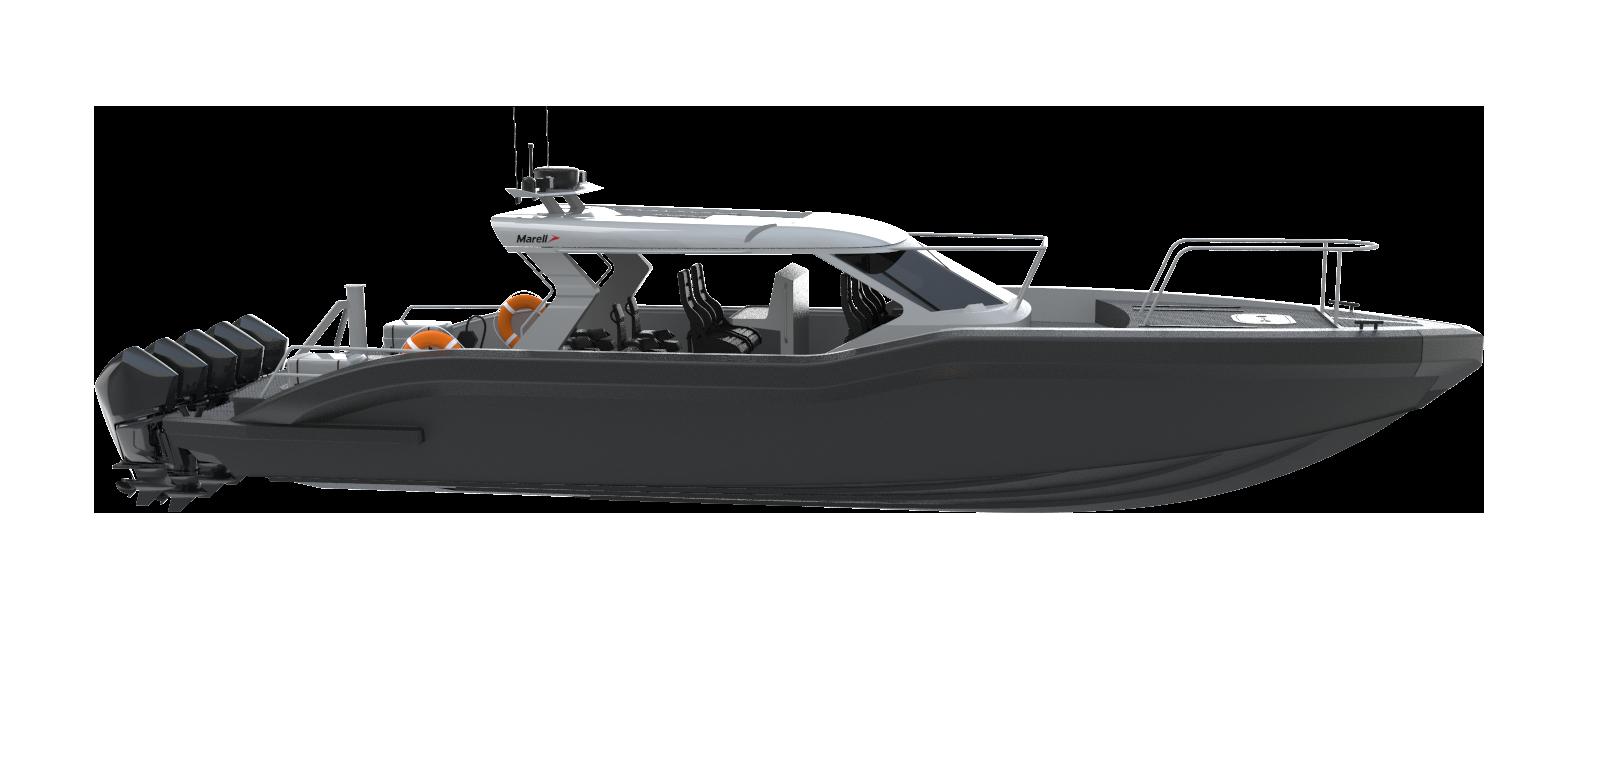 M15 patrol rendered boat model